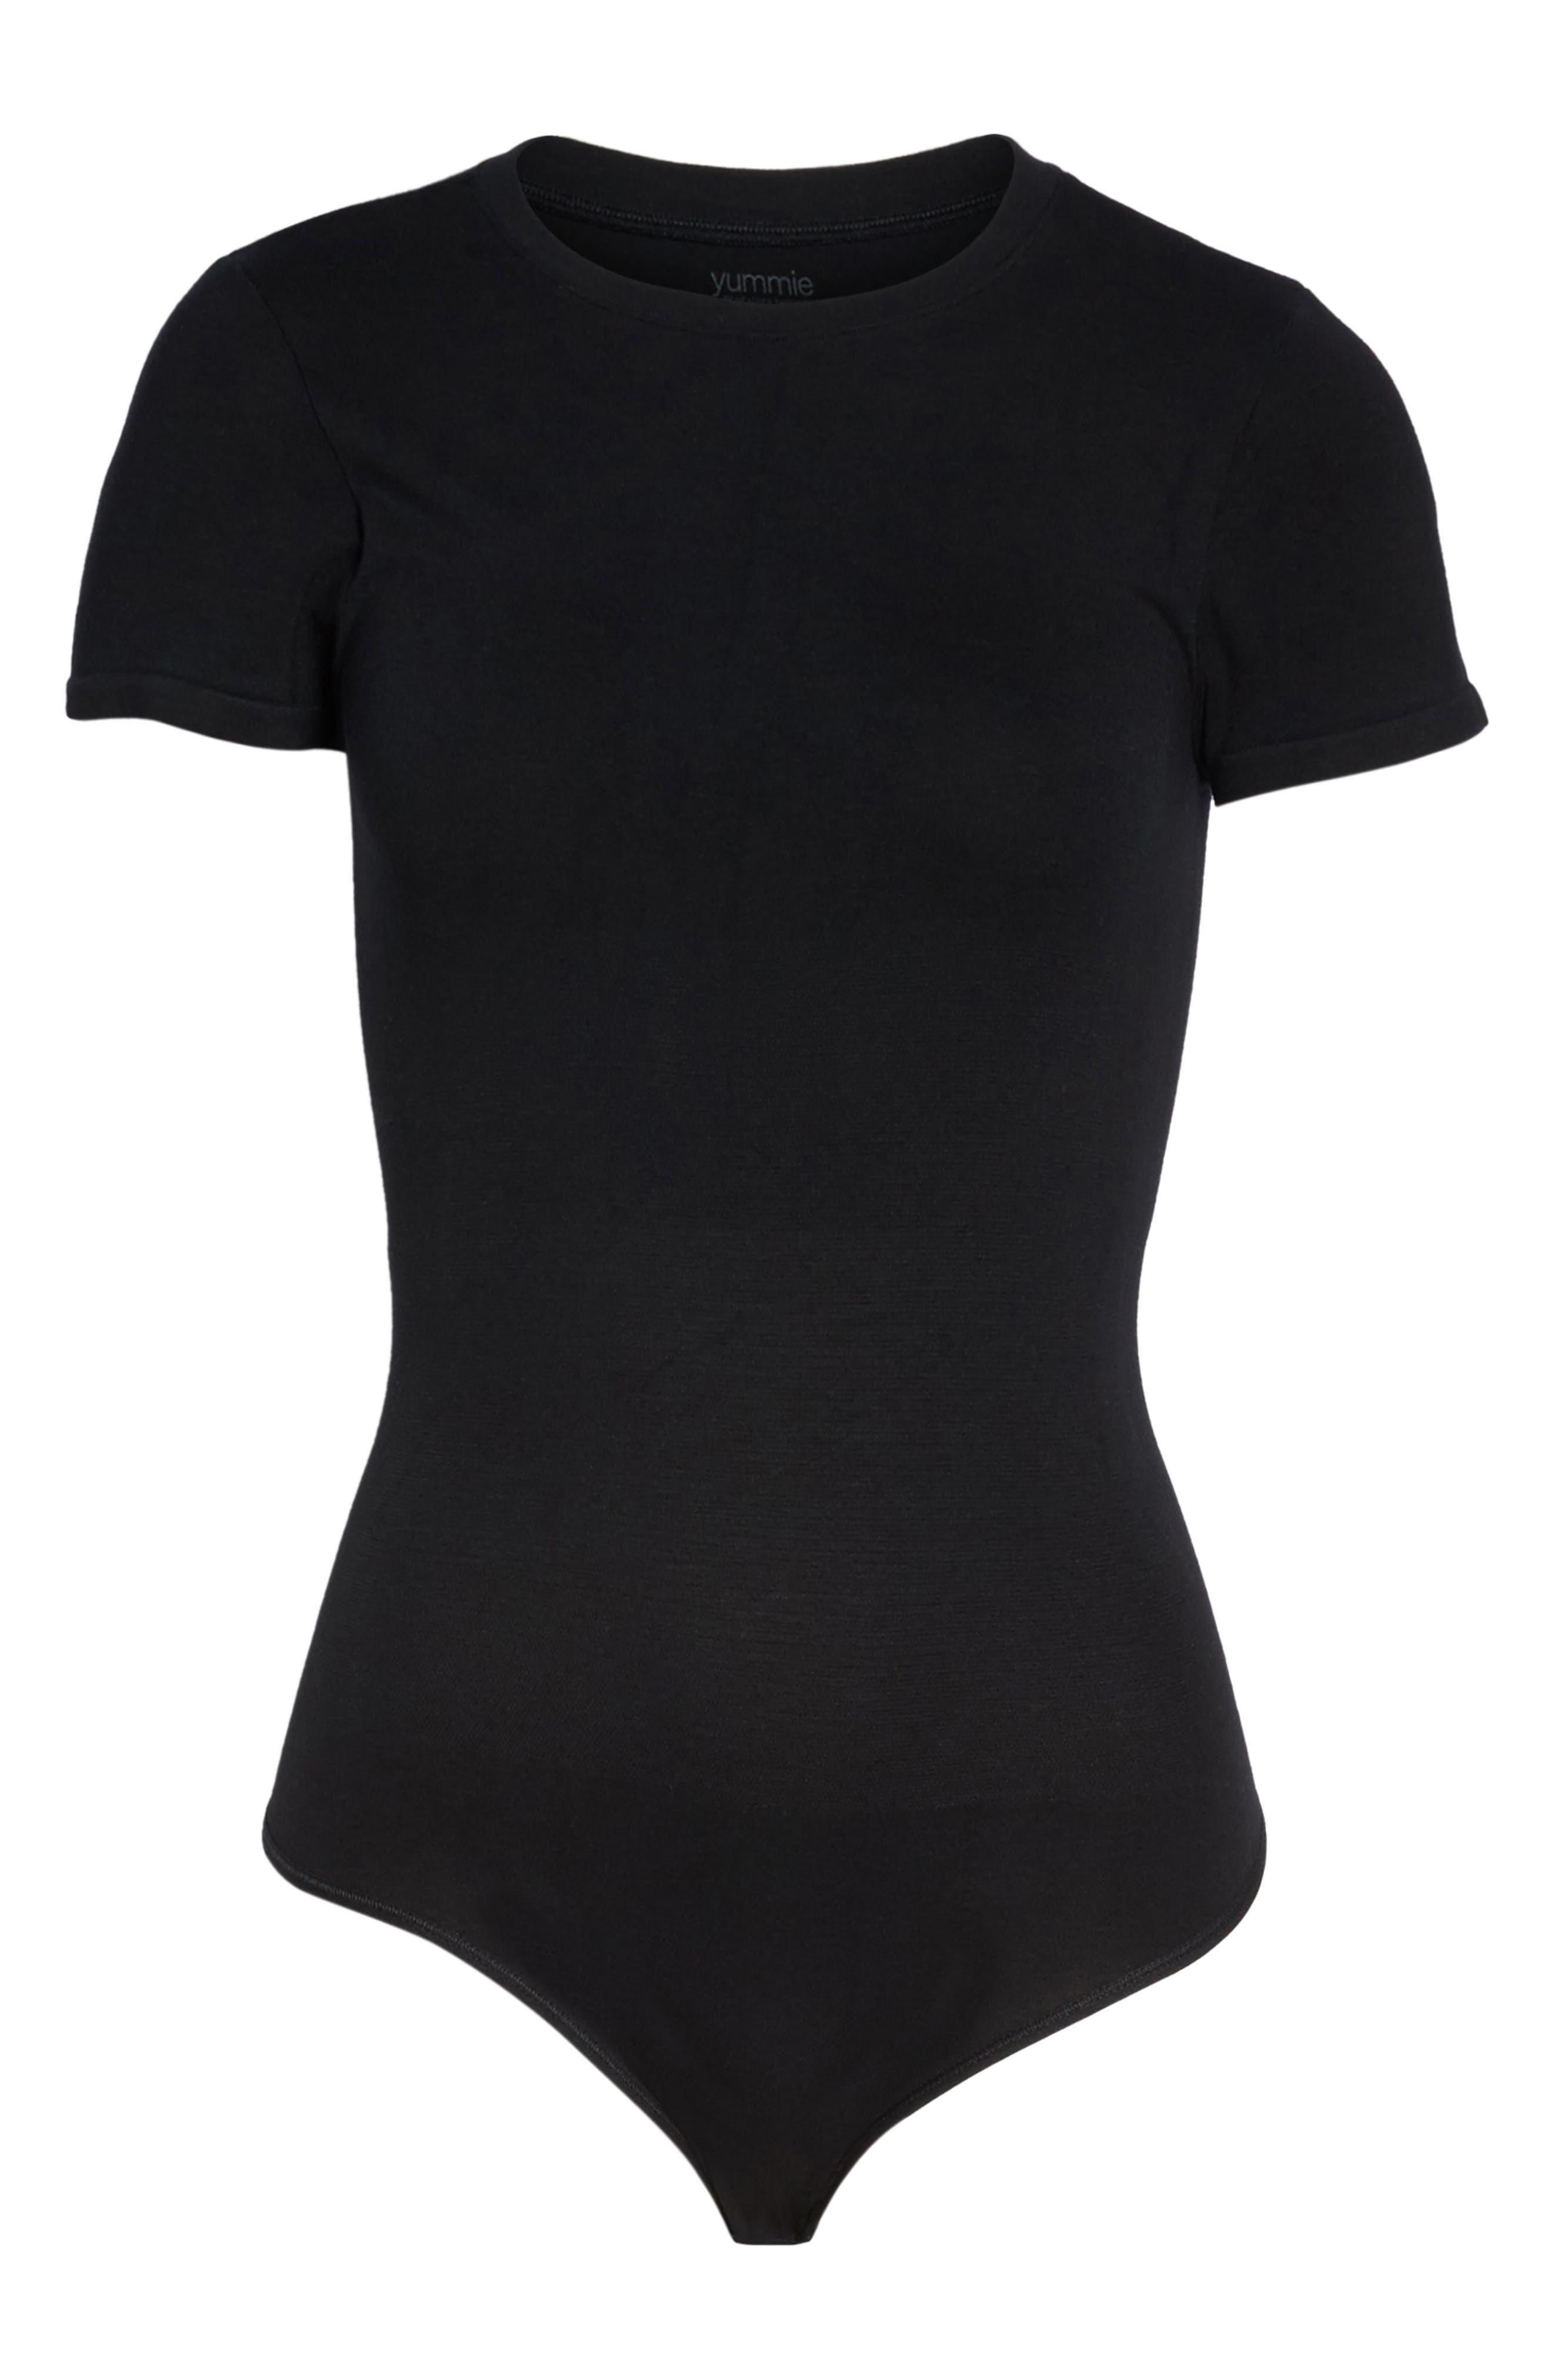 Thong Bodysuit,                             Alternate thumbnail 7, color,                             BLACK